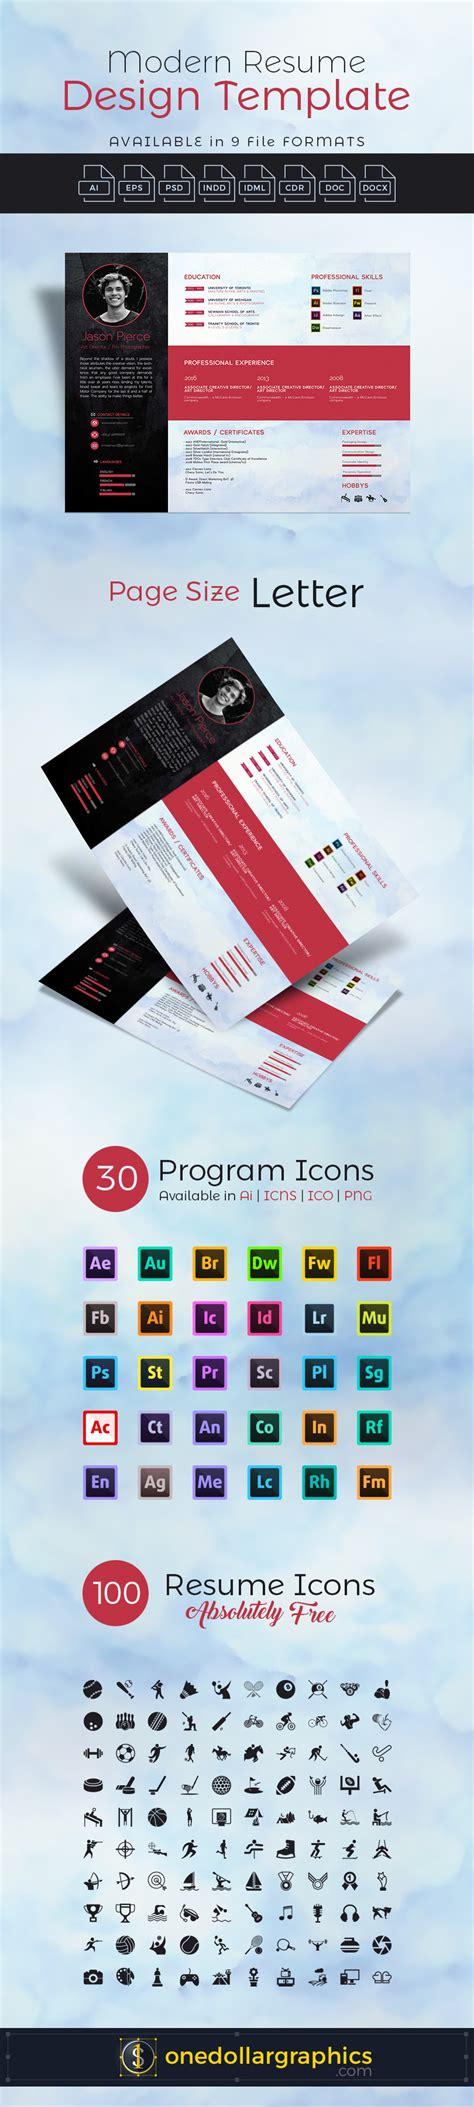 modern resume cv design template in psd ai eps indd